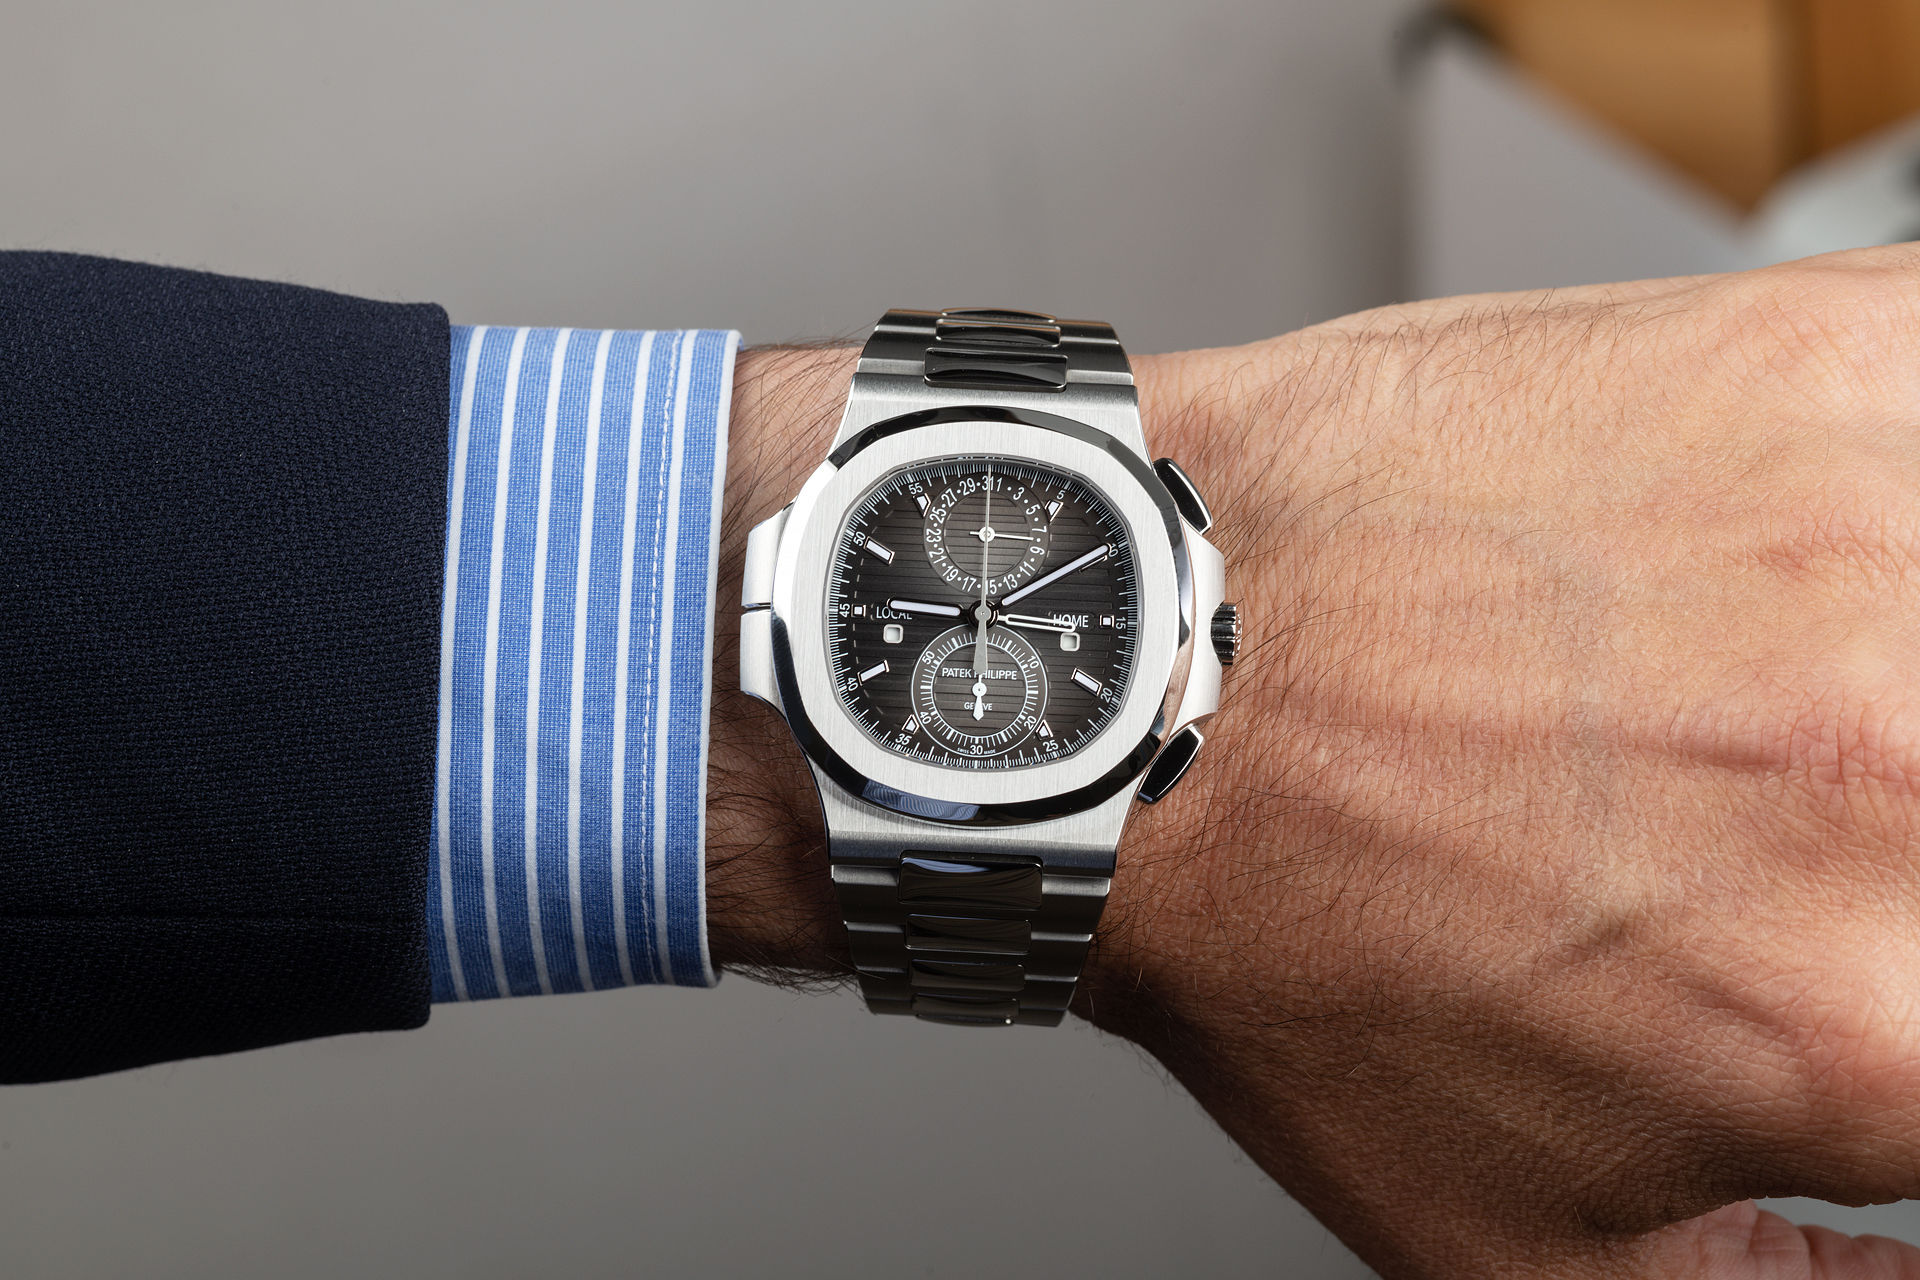 Patek Philippe Nautilus Watches | ref 5990/1A-001 | 'Brand New ...